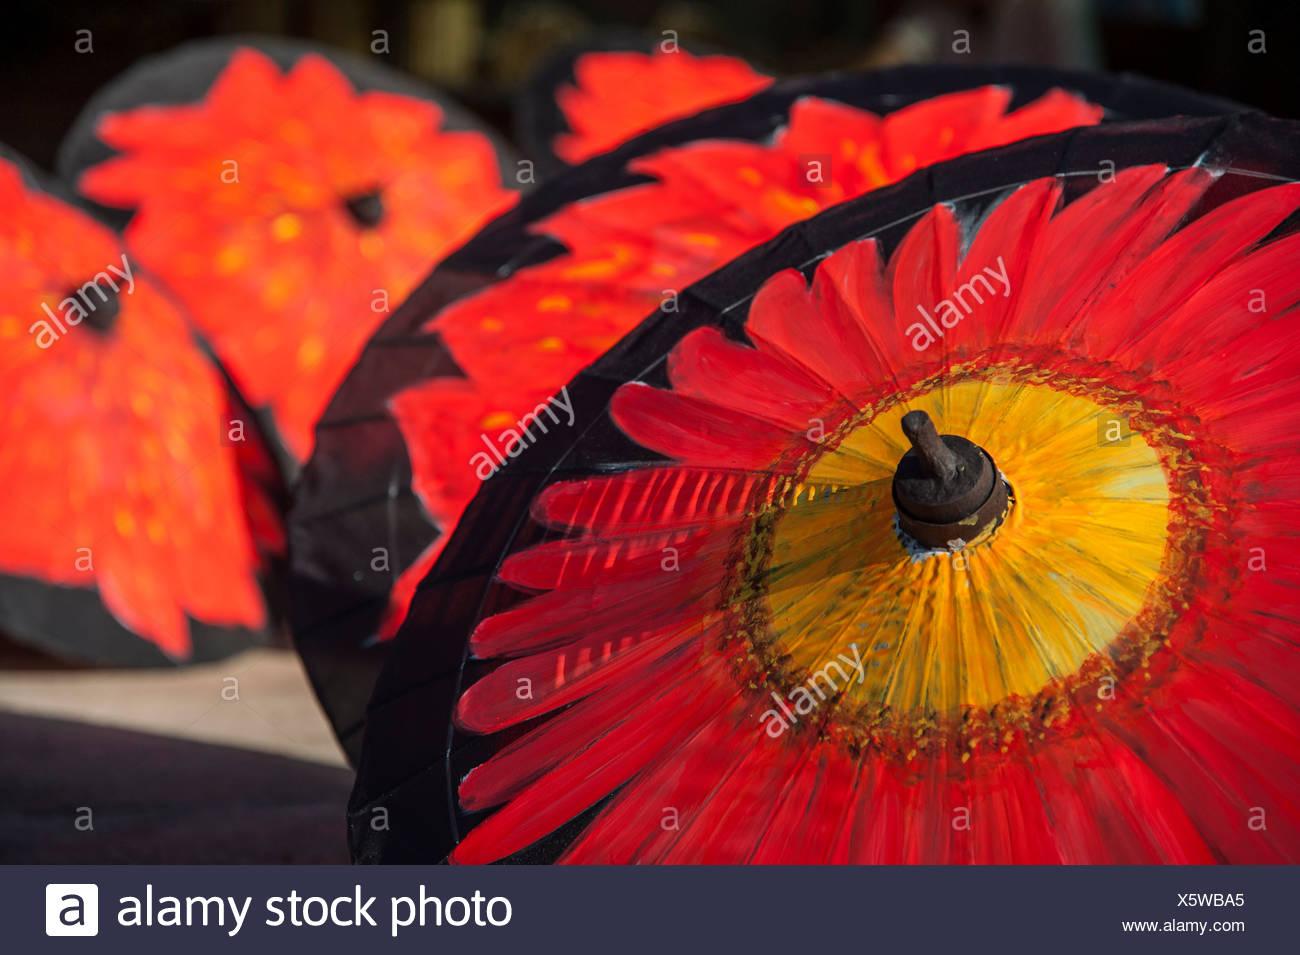 Büttenpapier bunte Regenschirme, Bo Sang, Chiang Mai, Nord-Thailand, Thailand, Asien Stockbild